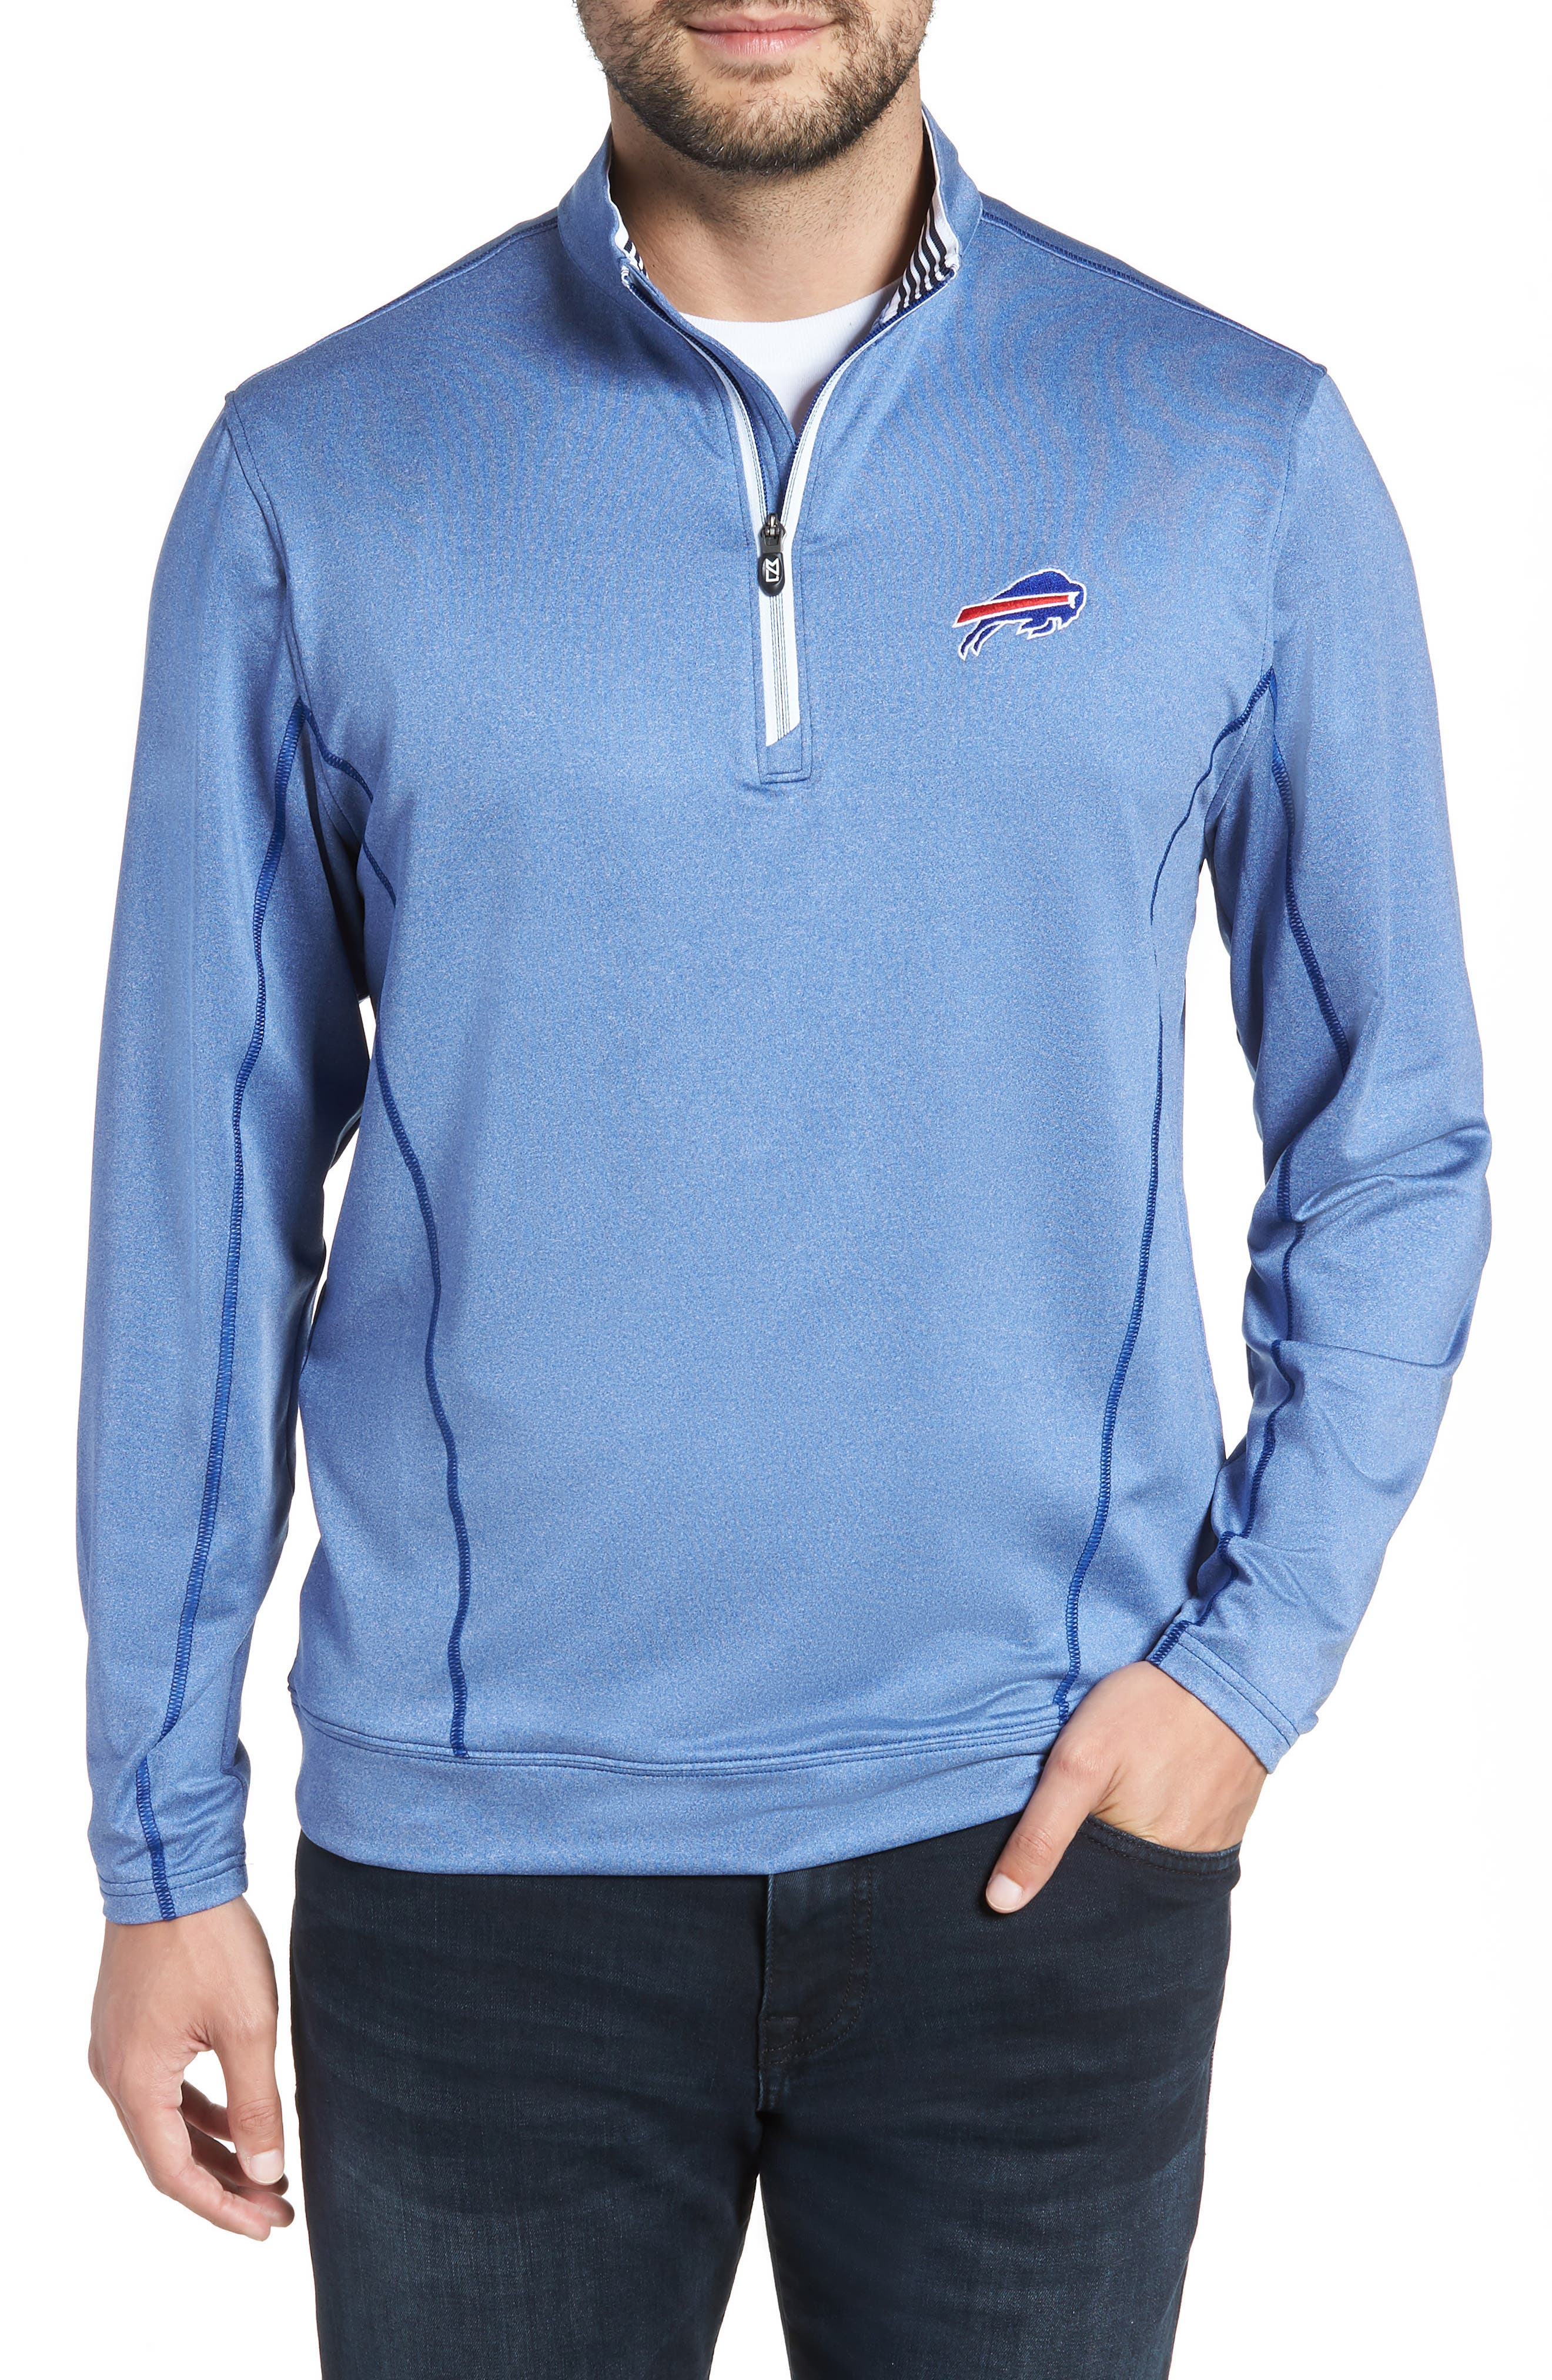 Endurance Buffalo Bills Regular Fit Pullover,                         Main,                         color, TOUR BLUE HEATHER